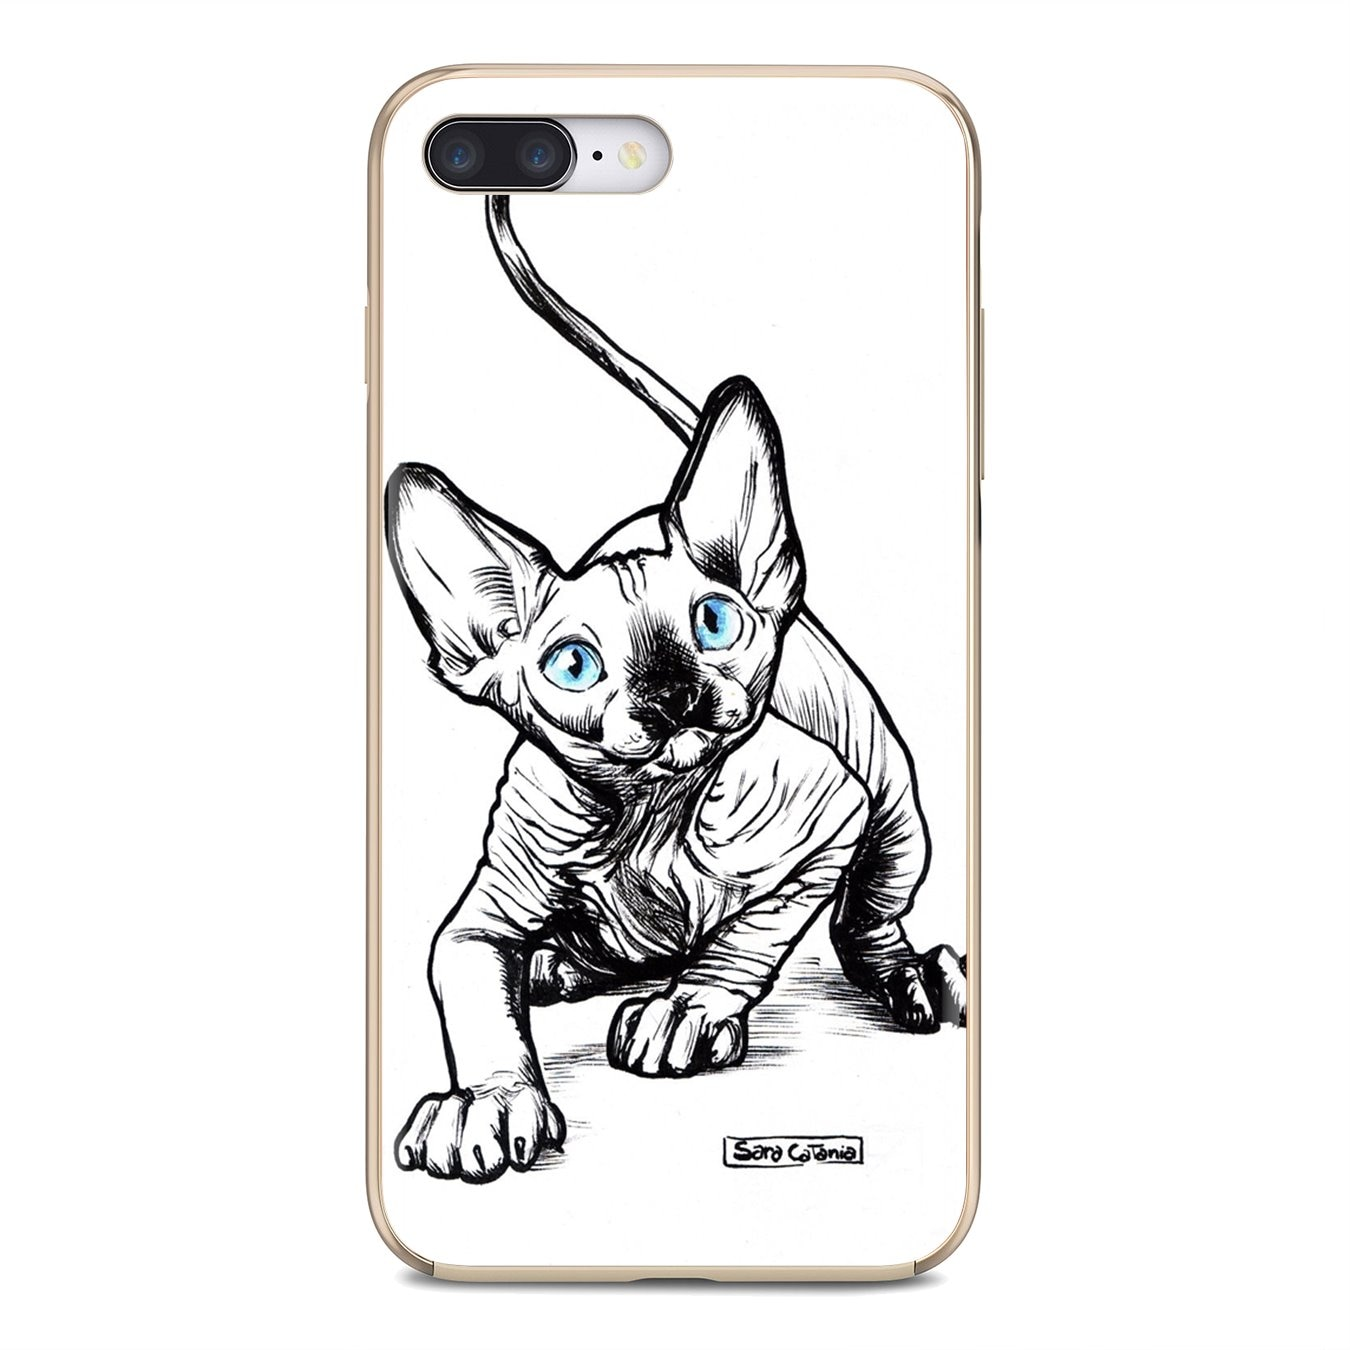 Para sony xperia z5 xz xa1 xa2 premium ultra 10 x l2 mão desenhar imagem retrato gato coroa original silicone telefone caso